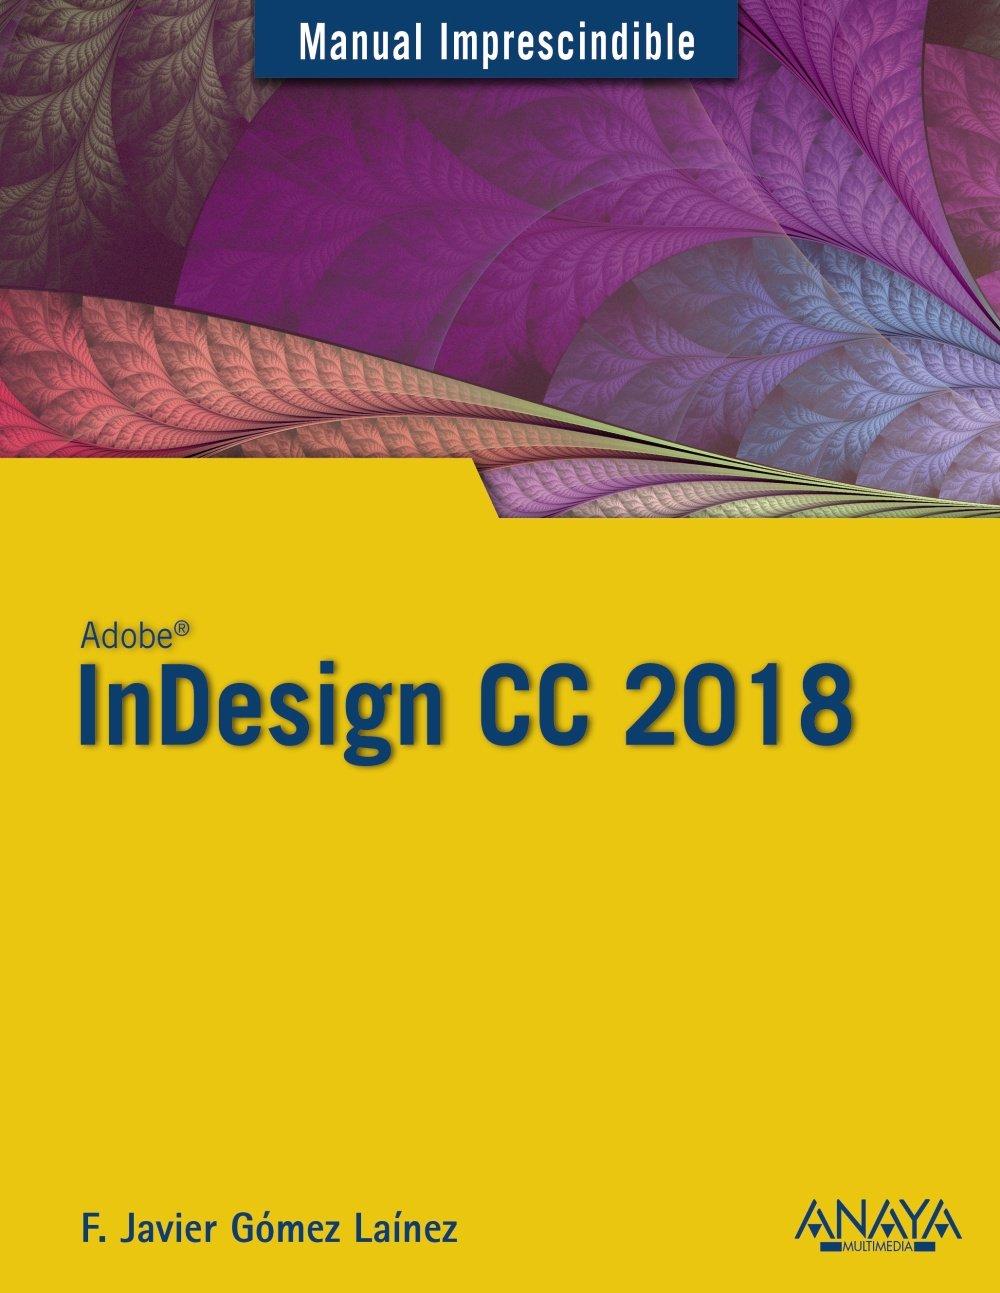 InDesign CC 2018 (Manuales Imprescindibles): Amazon.es: Francisco ...